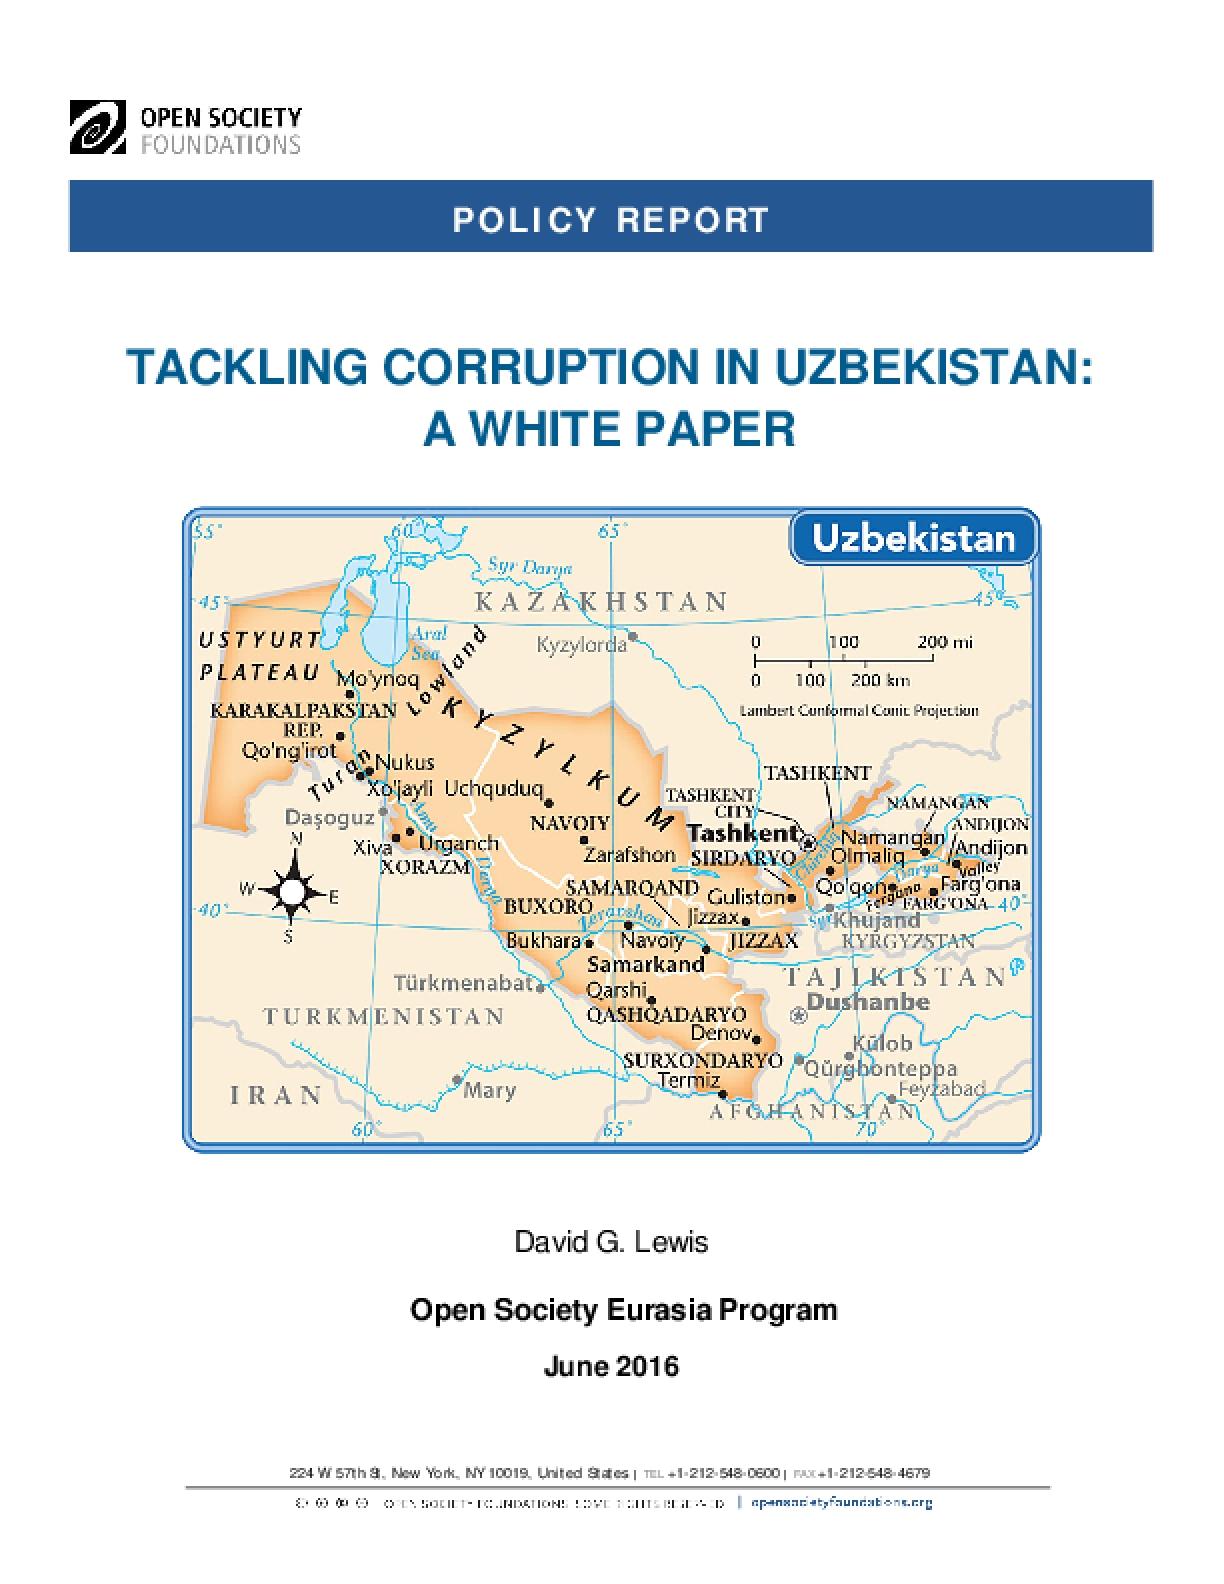 Tackling Corruption in Uzbekistan